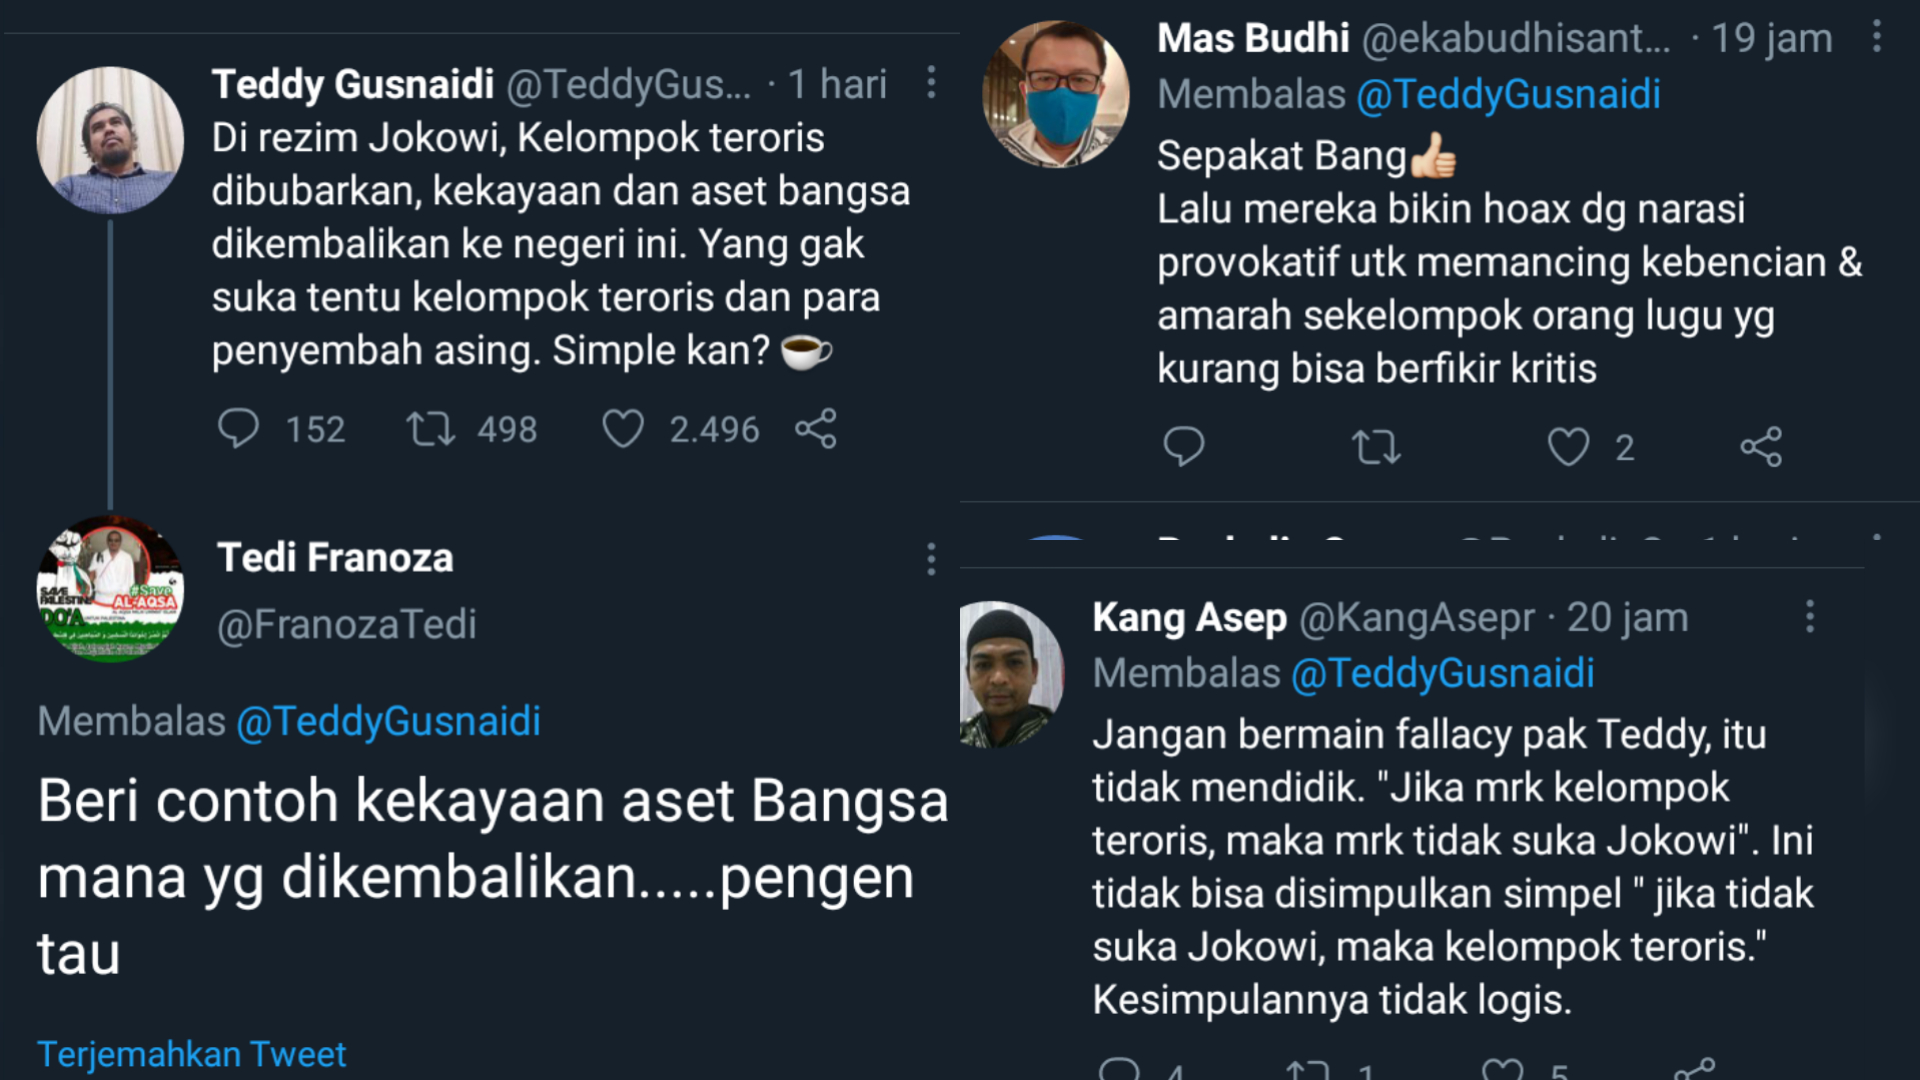 Sindir Pihak yang Tak Suka Rezim Jokowi, Teddy Gusnaidi: Dasar Kelompok Penyembah Asing!